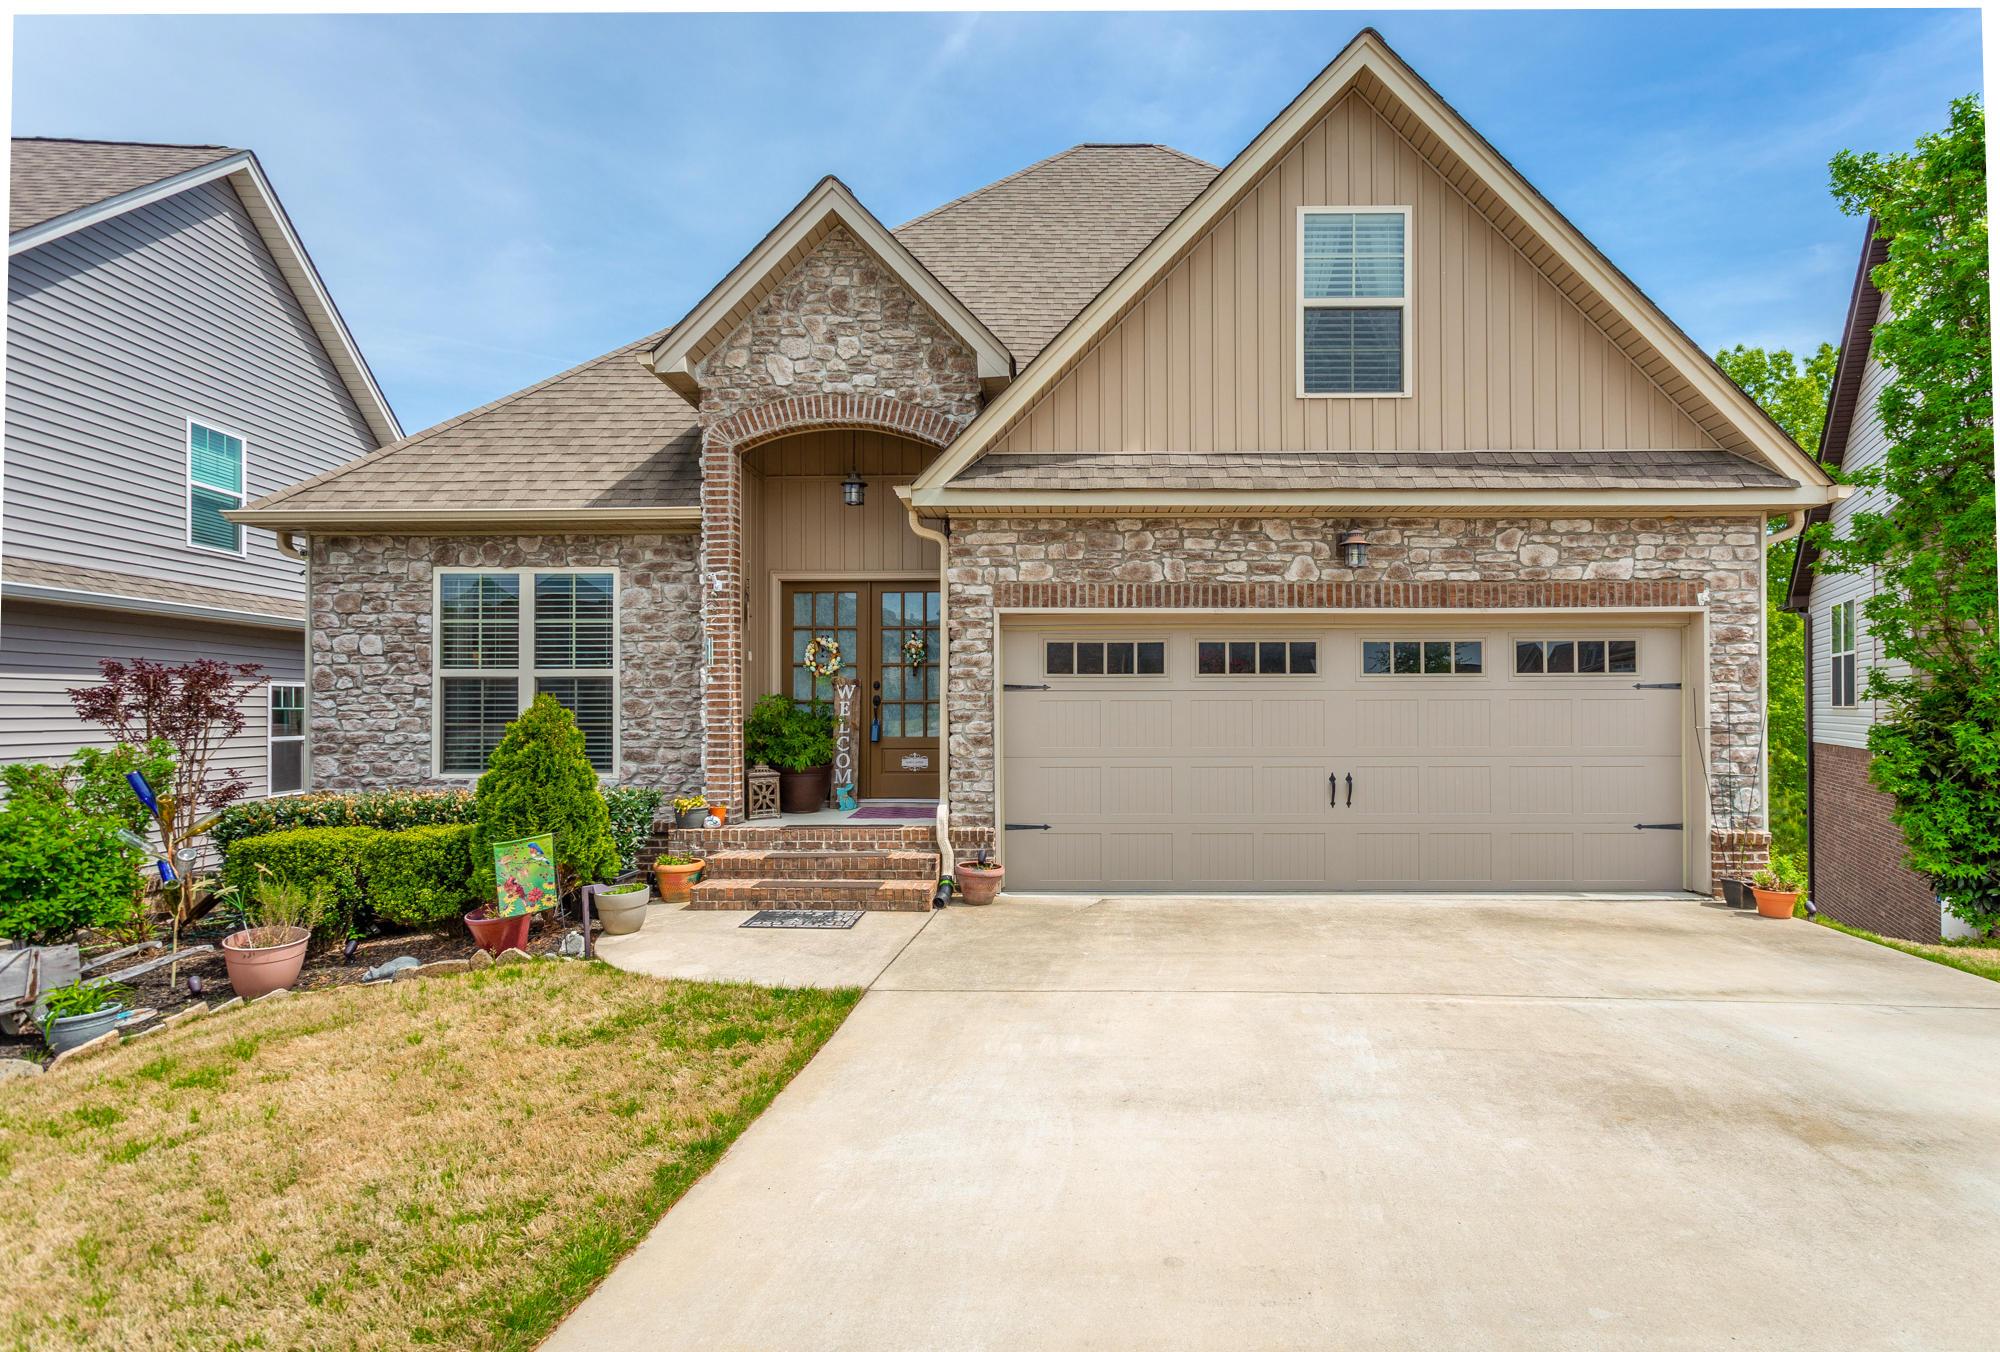 6740 Kenton Ridge Cir, Chattanooga, TN 37421